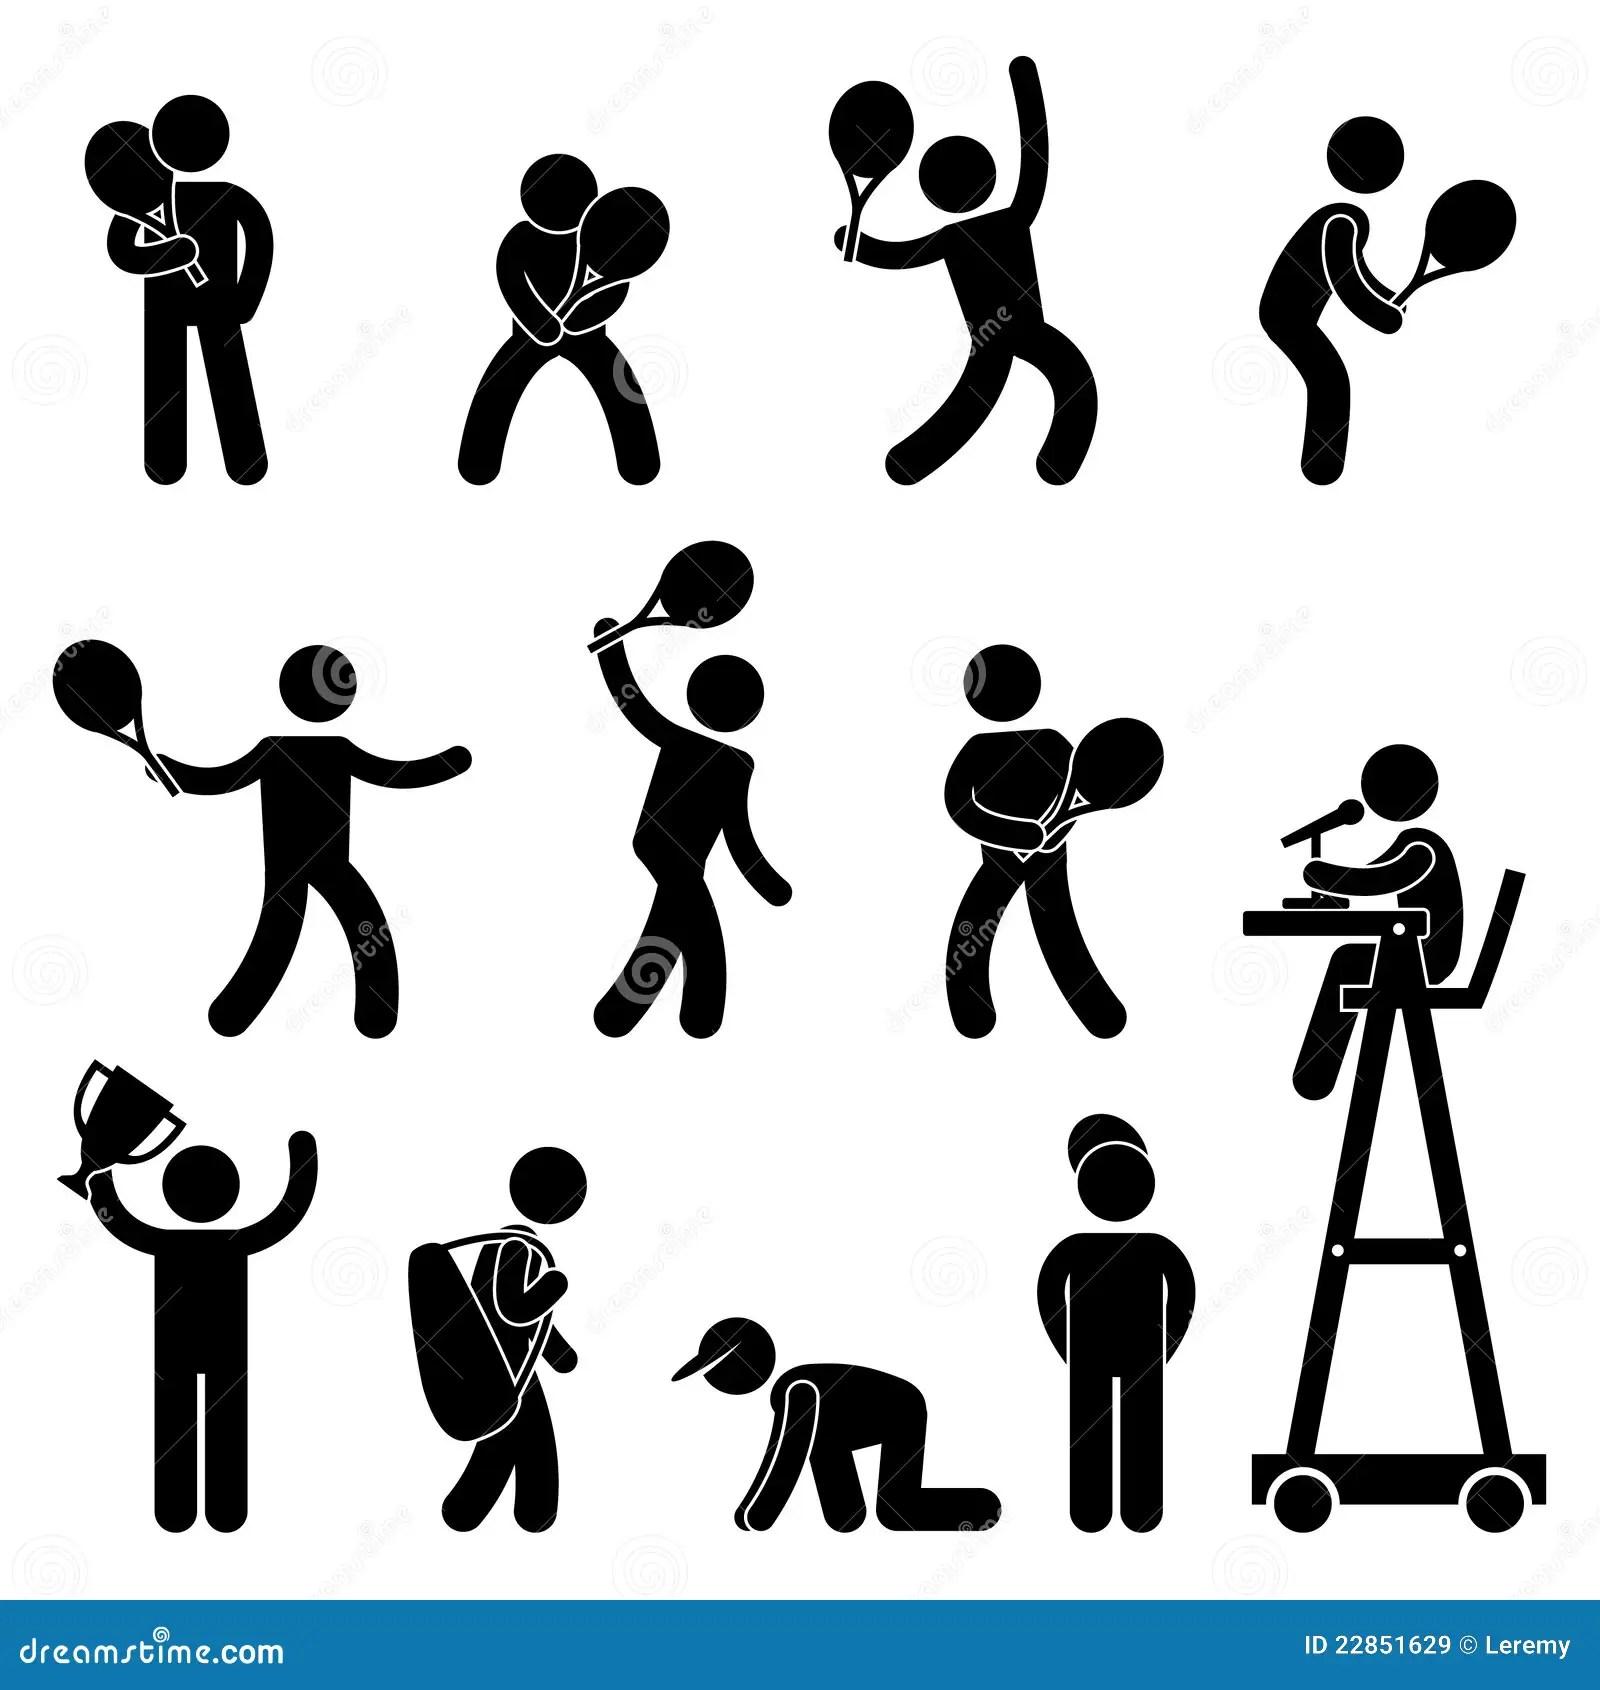 Tennis Player Umpire Pictogram Icon Pictogram Stock Vector